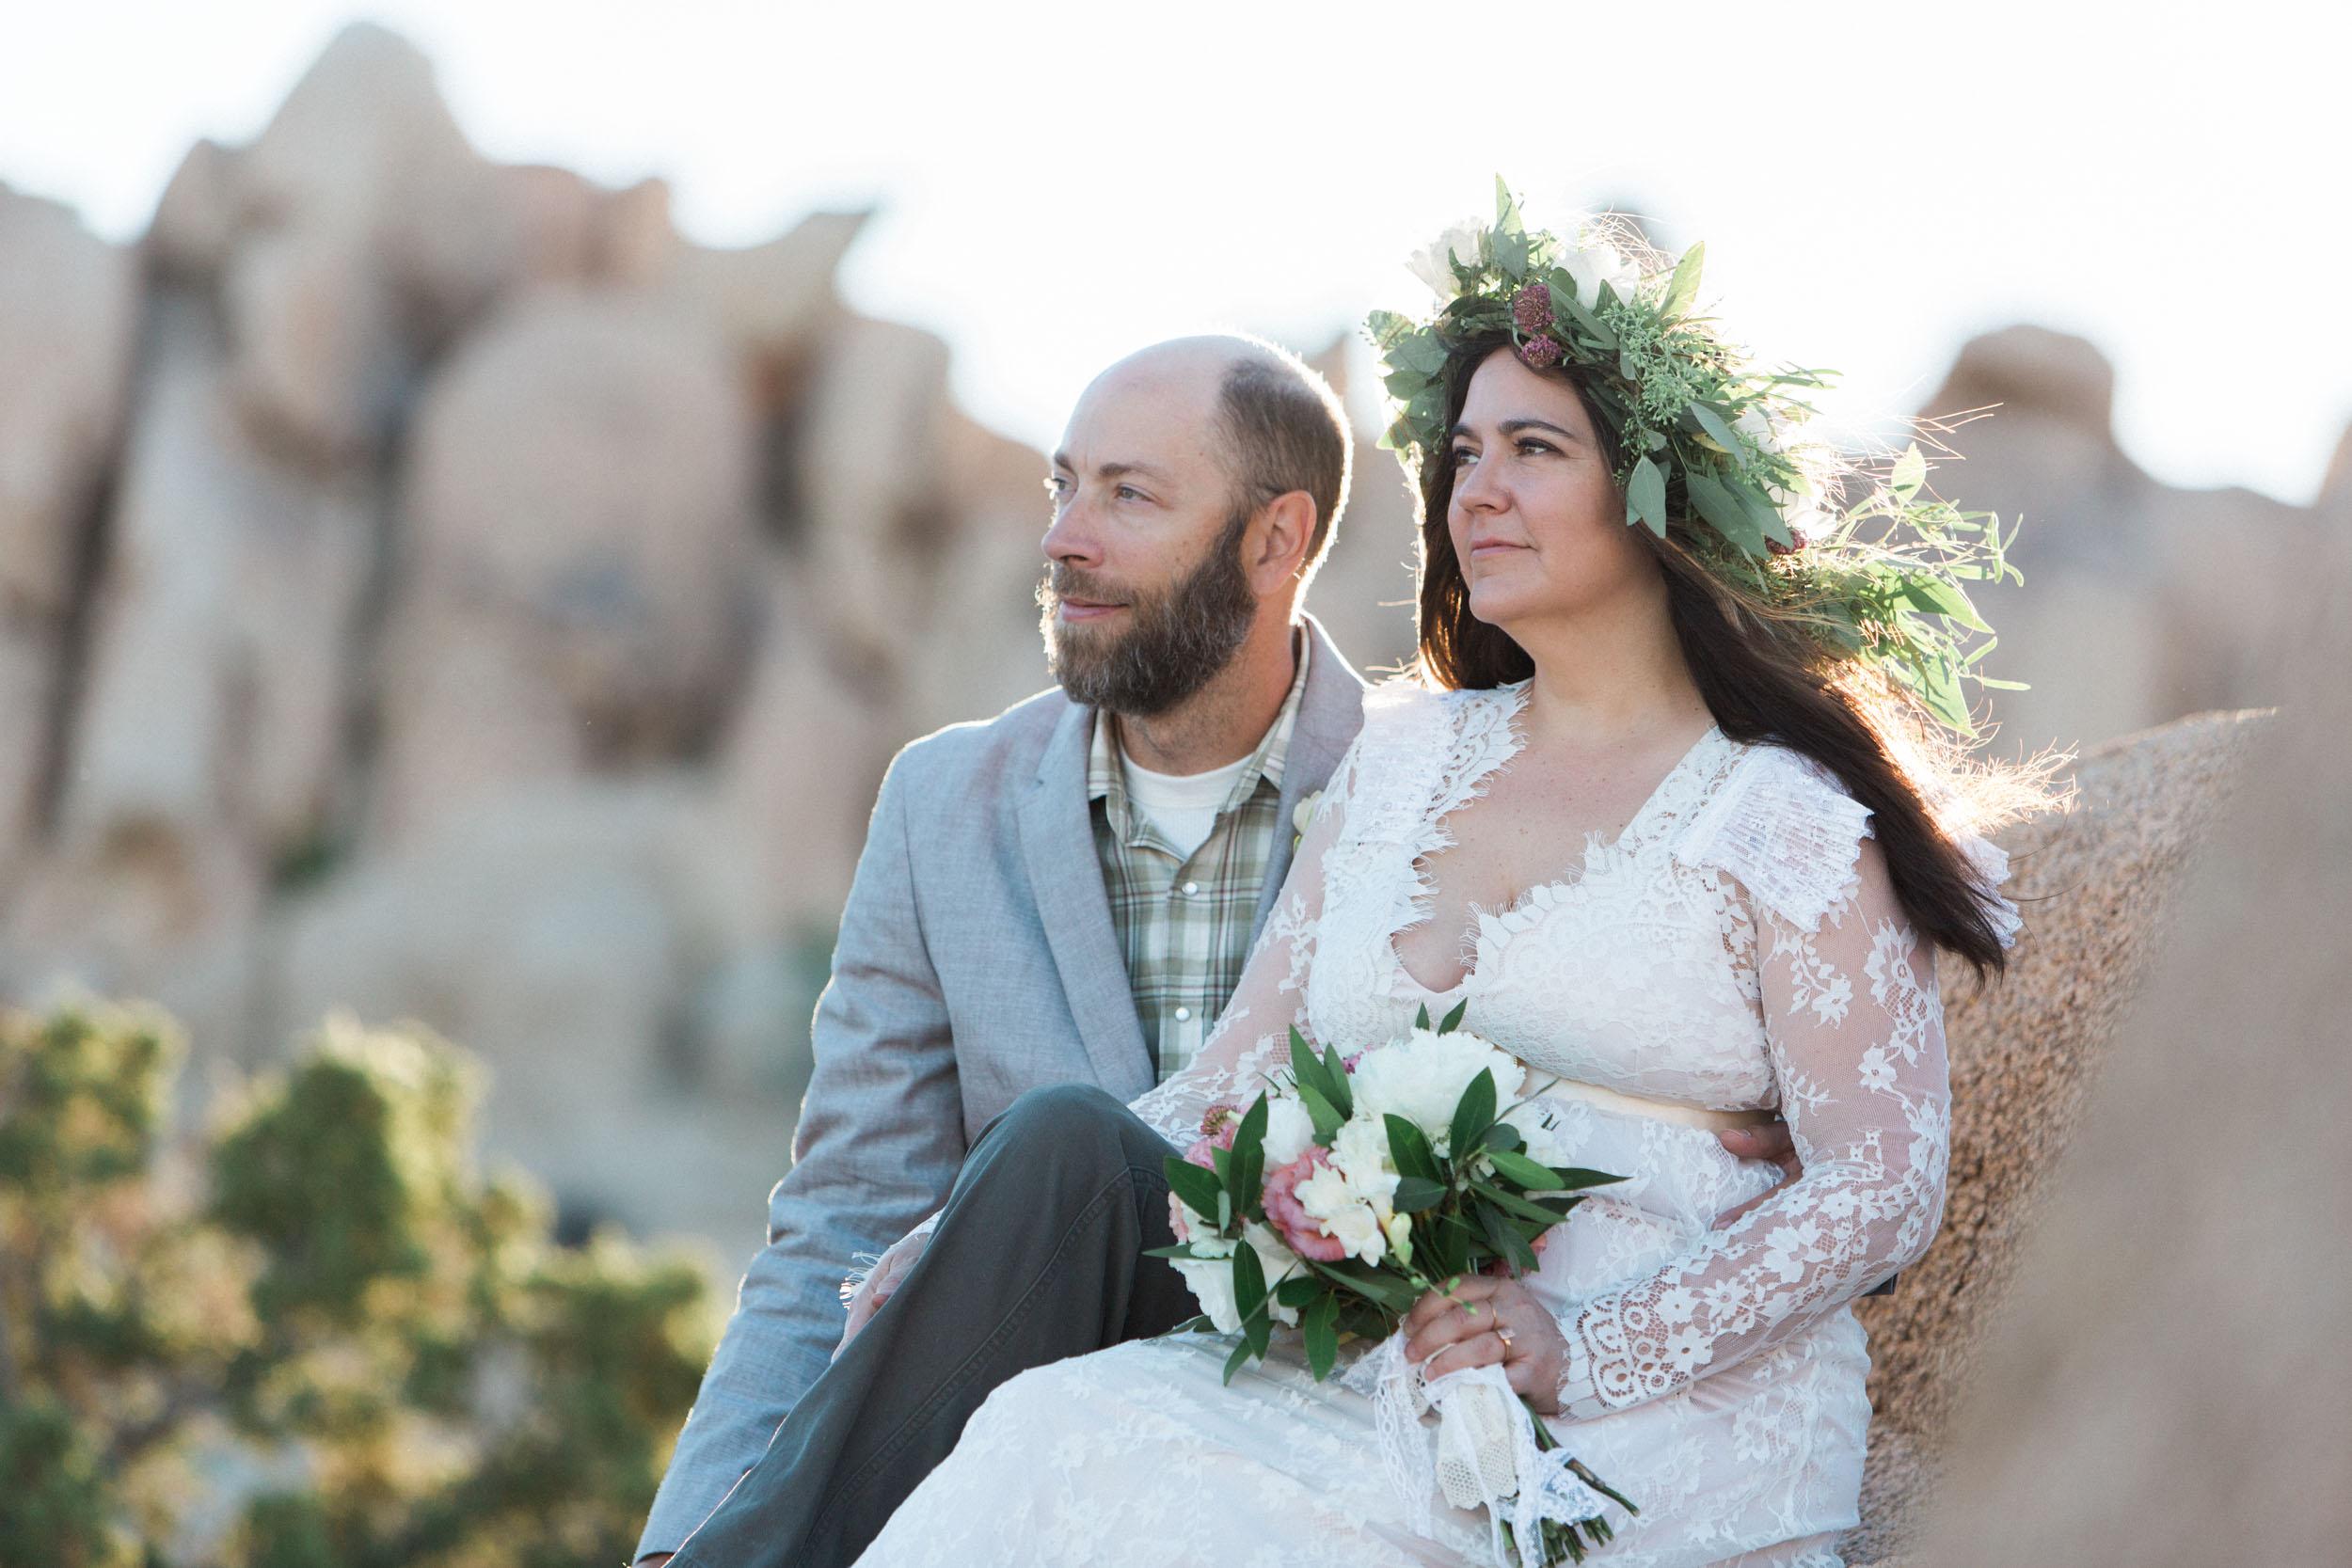 BKM-Photography-Joshua-Tree-Desert-Wedding-Elopement-0023.jpg